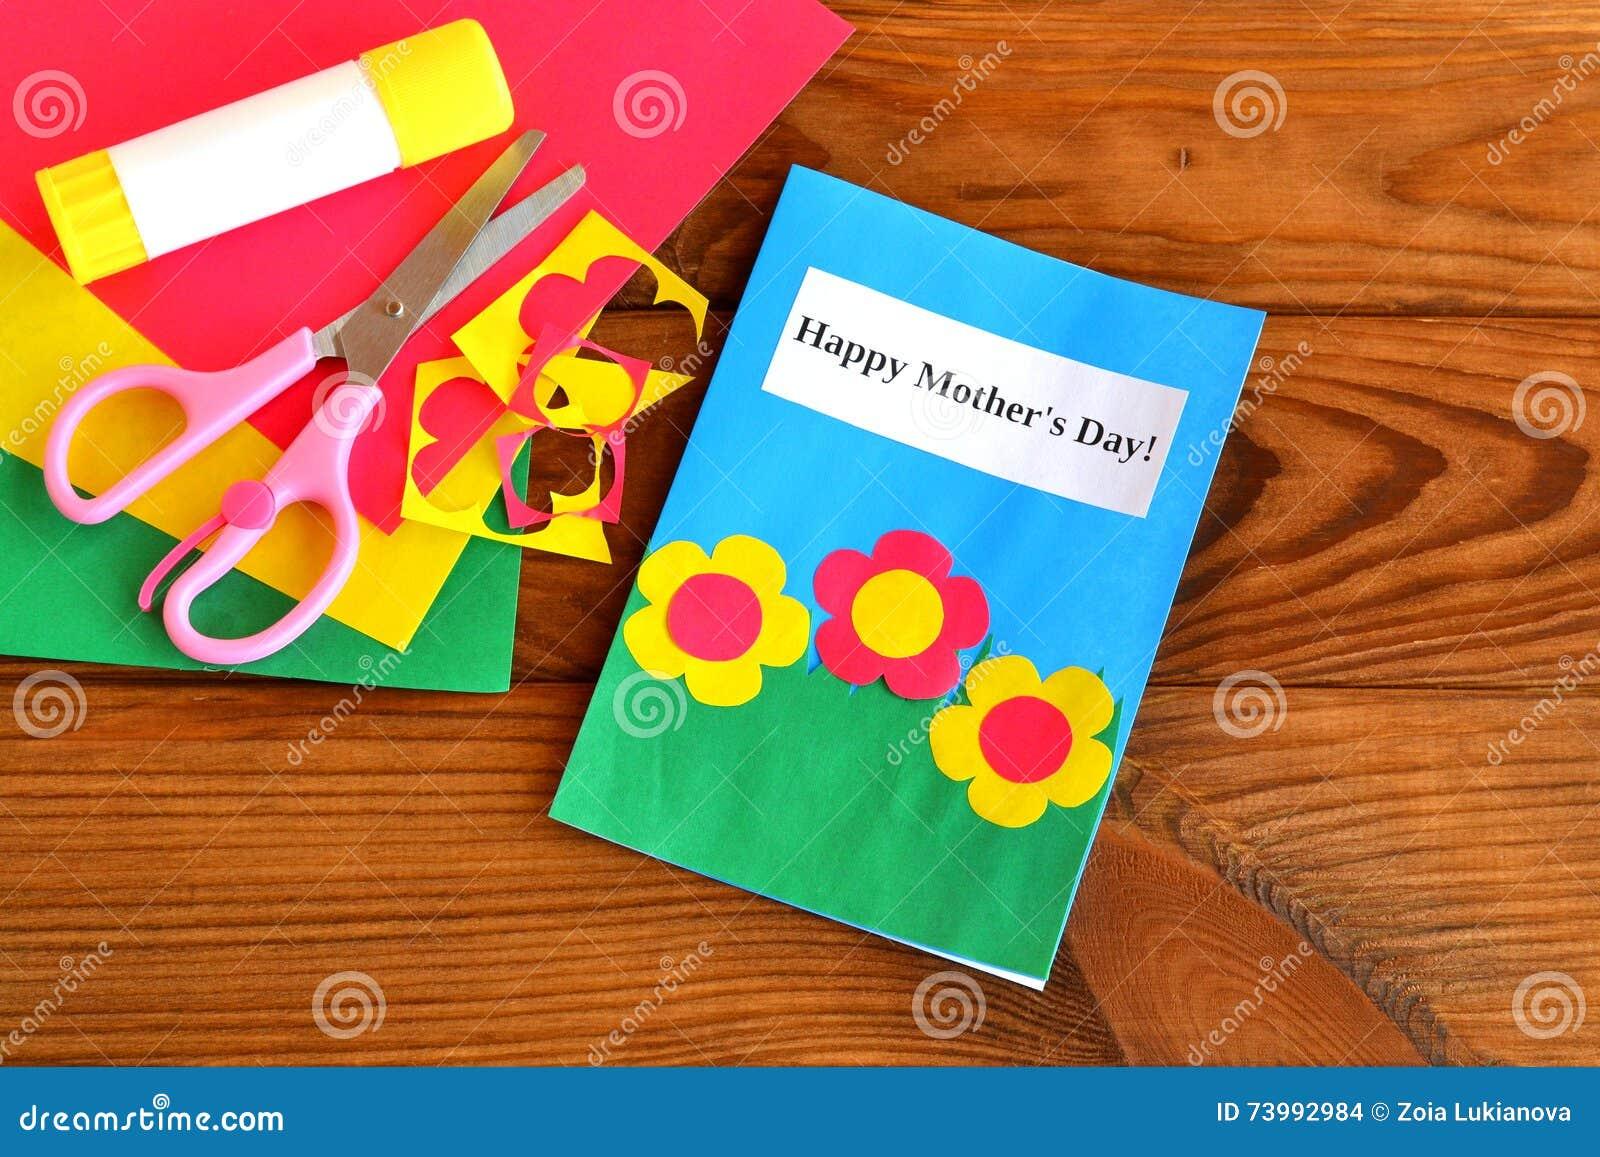 Greeting Card Happy Mother S Day Children Crafts Scissors Glue